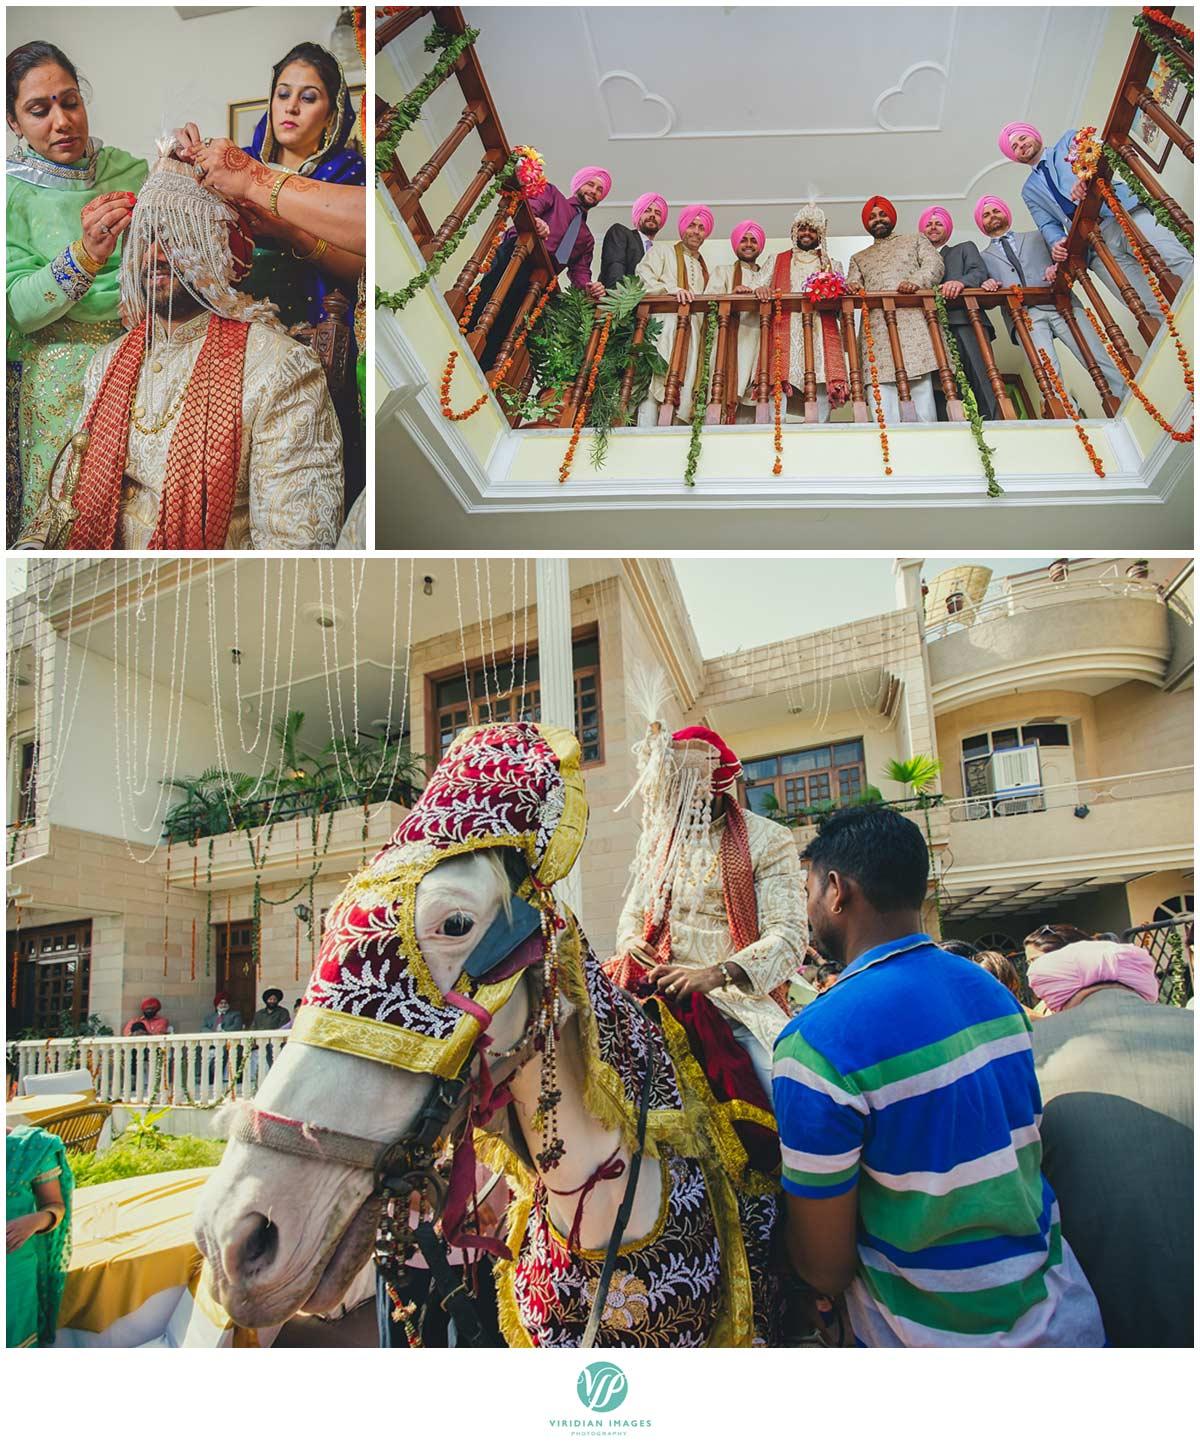 India_Chandigarh_Wedding_Viridian_Images_Photography_poto_11